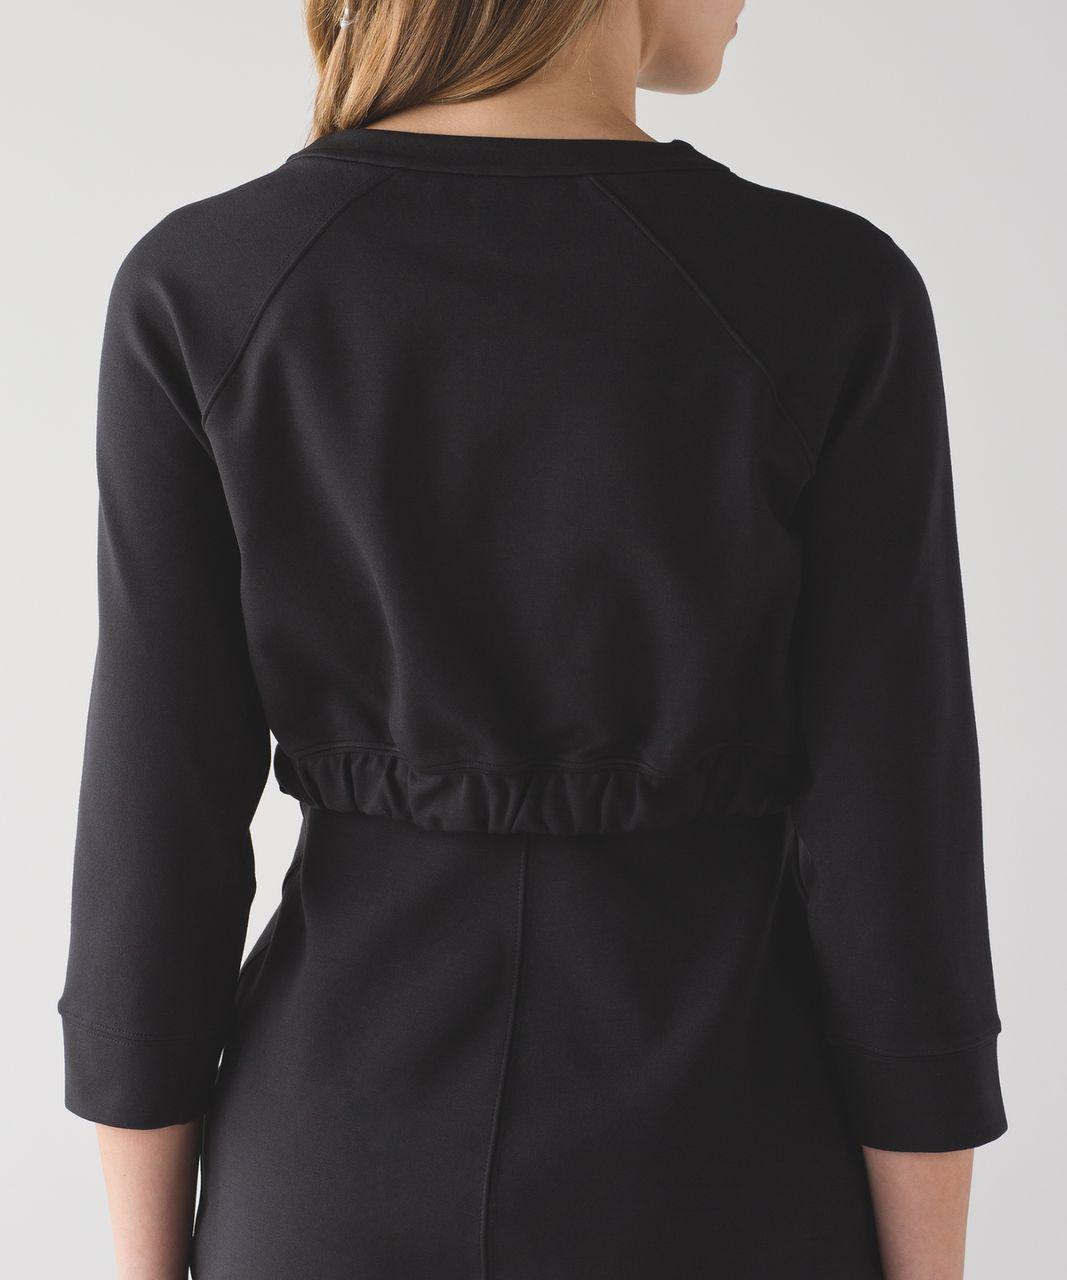 Lululemon Rite Time Dress - Black